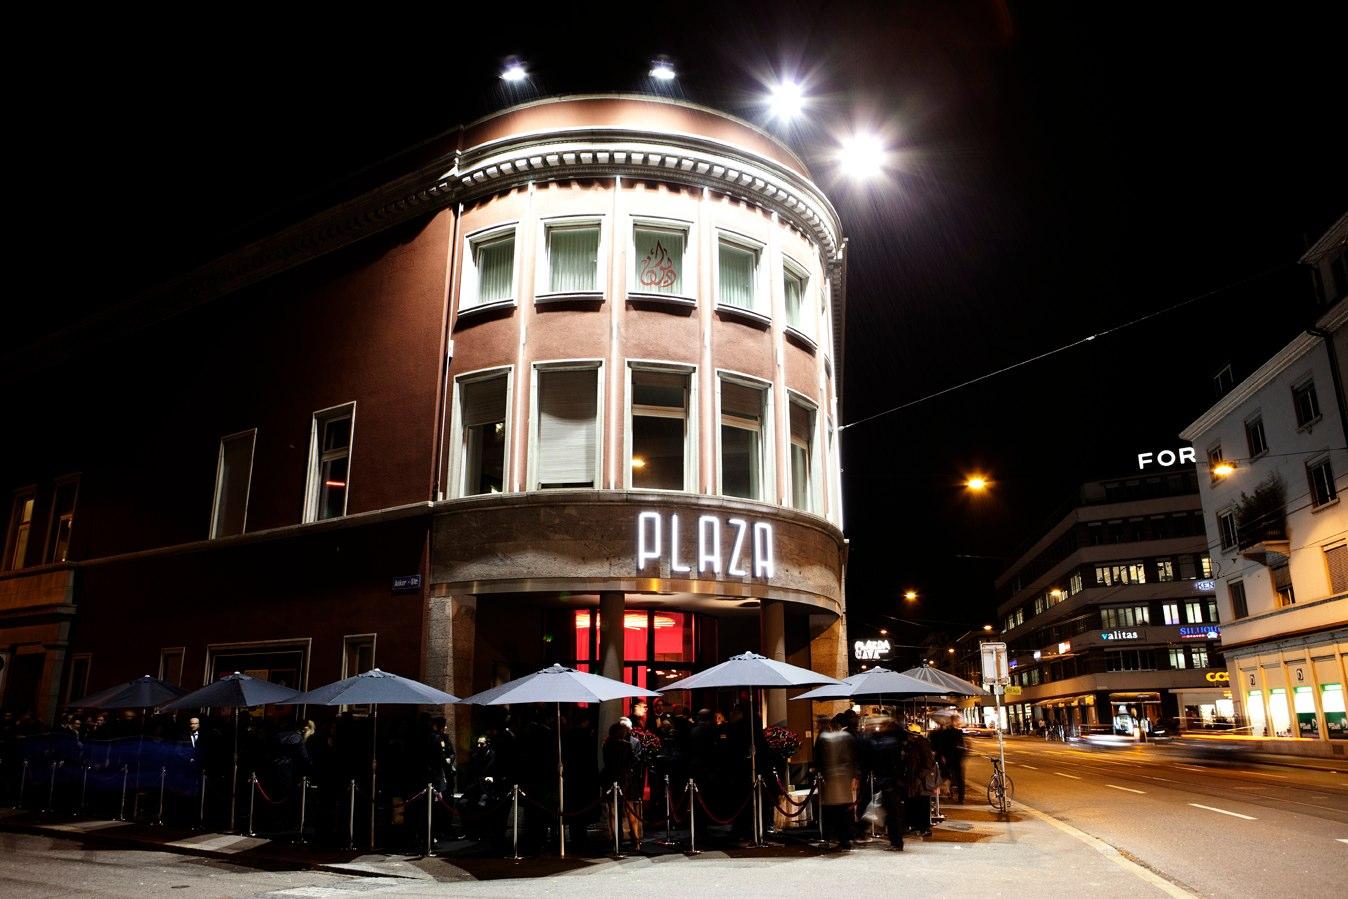 extellent-location-plaza-5